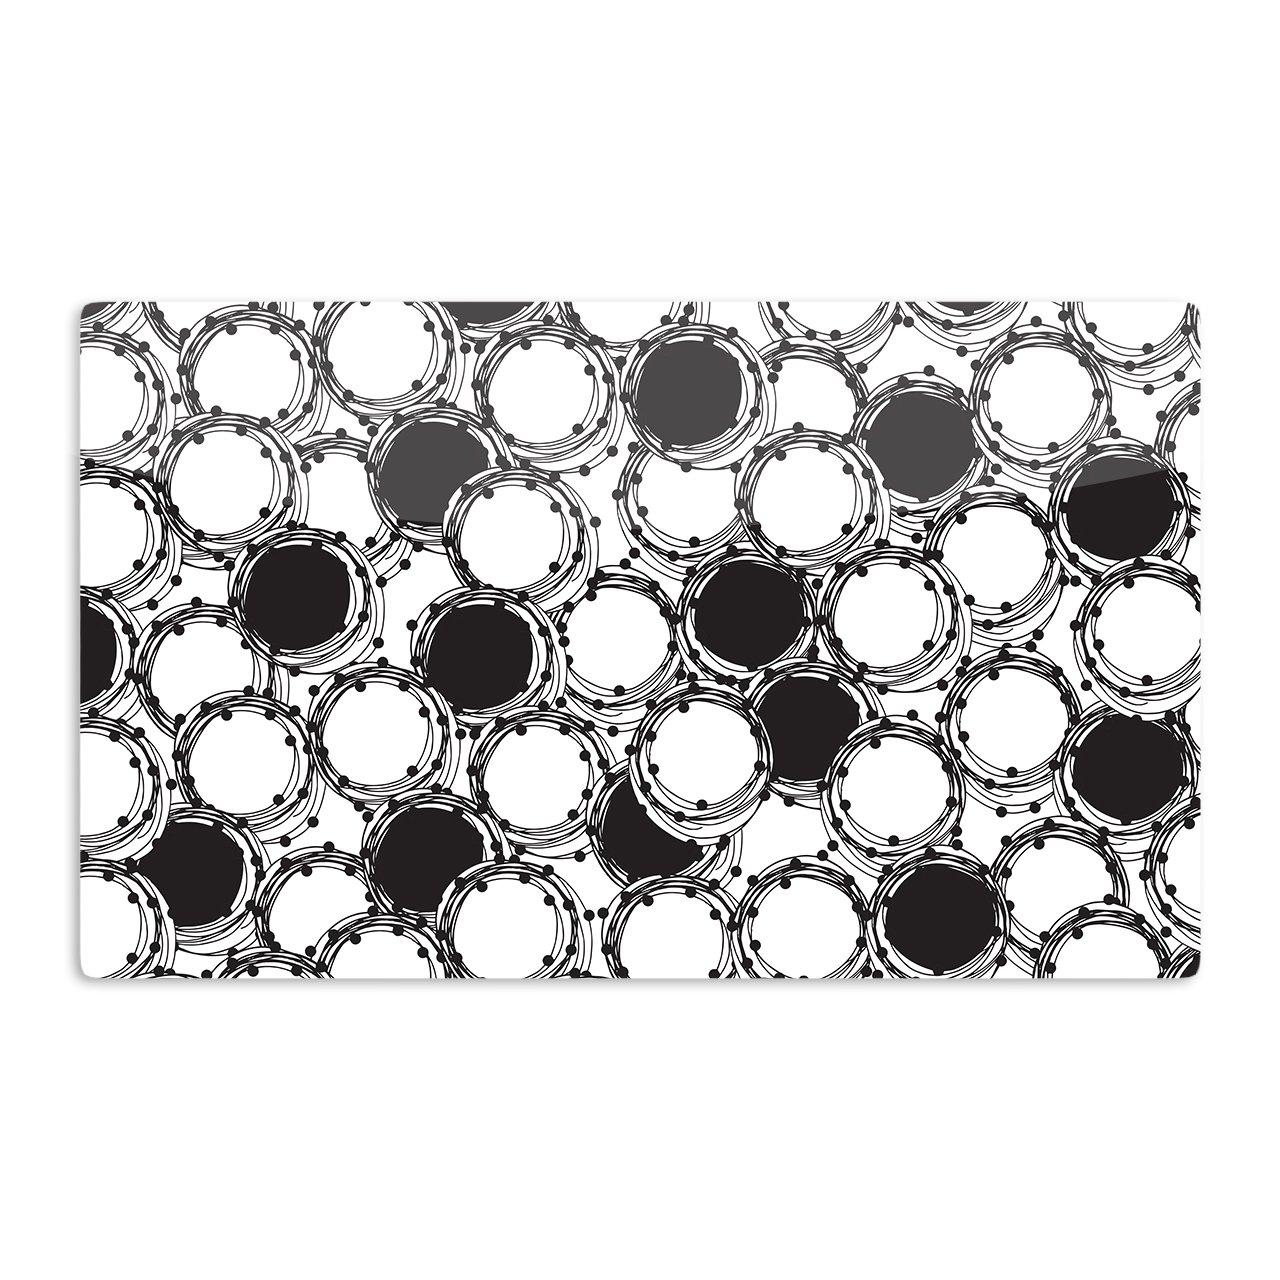 Multicolor KESS InHouse Nandita SinghBeaded Bangles Black White Artistic Aluminum Magnet 2 by 3